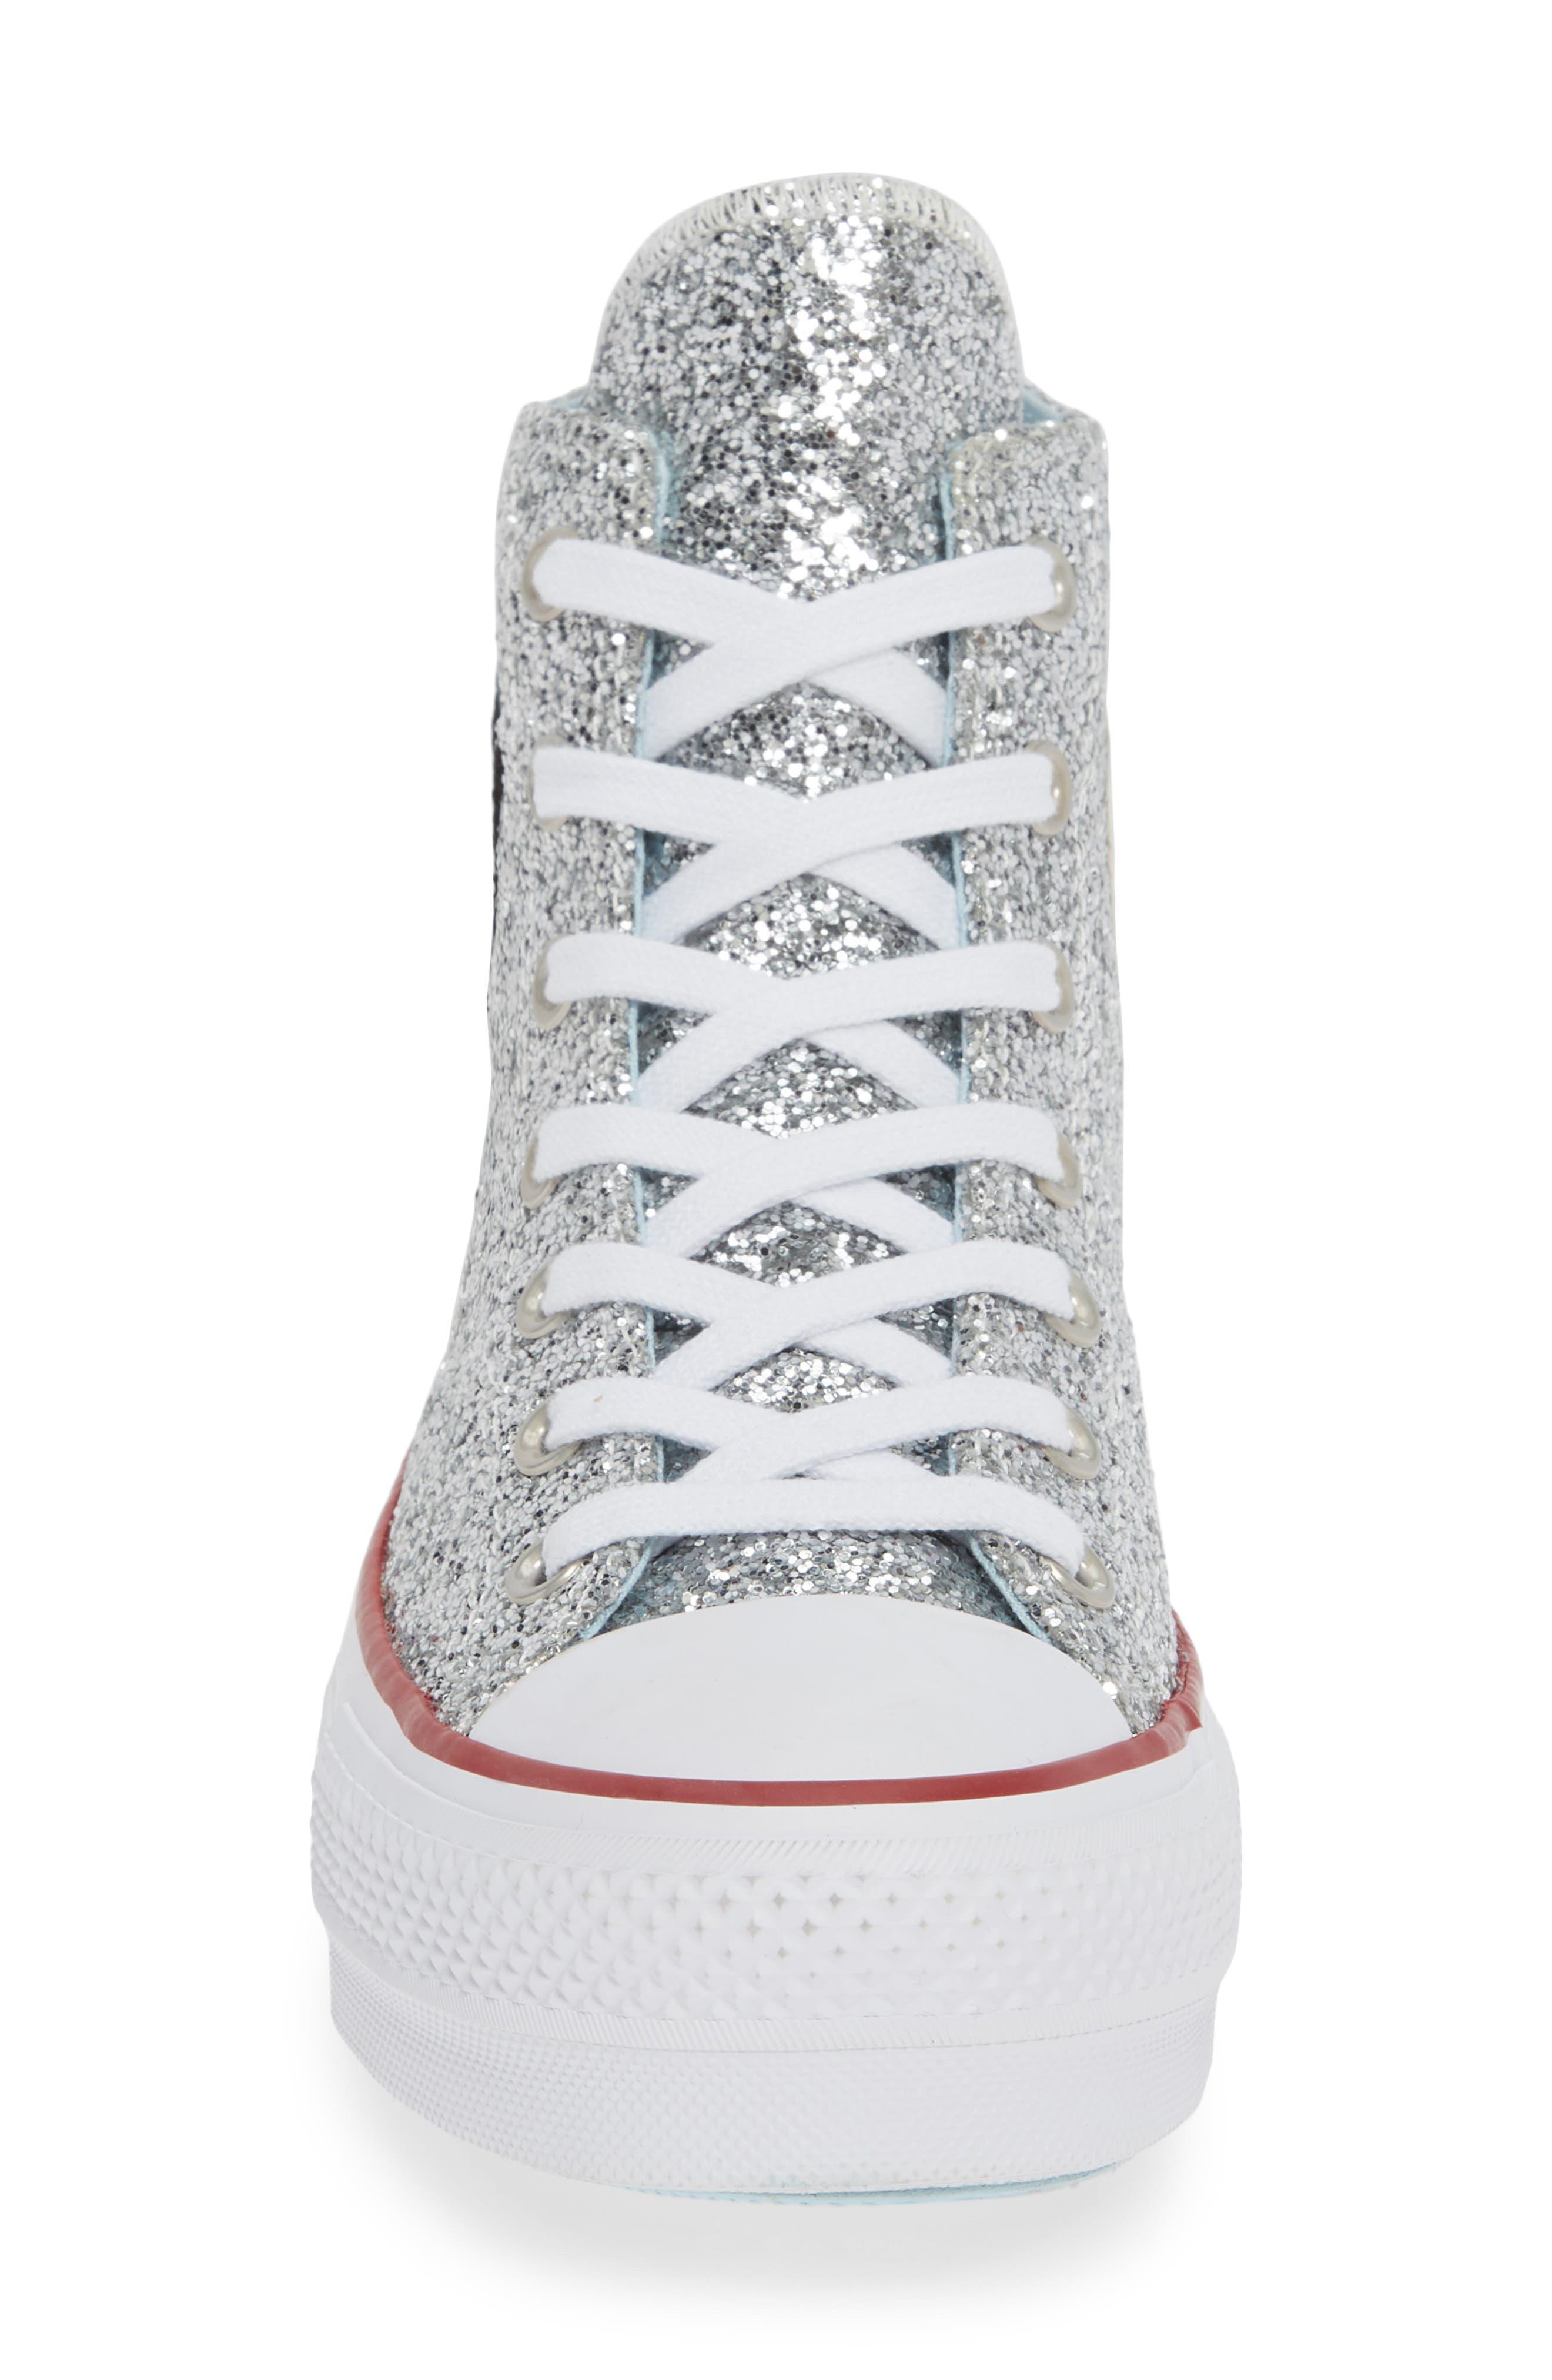 CONVERSE,                             x Chiara Ferragni 70 Hi One Star Glitter Platform Sneaker,                             Alternate thumbnail 4, color,                             040